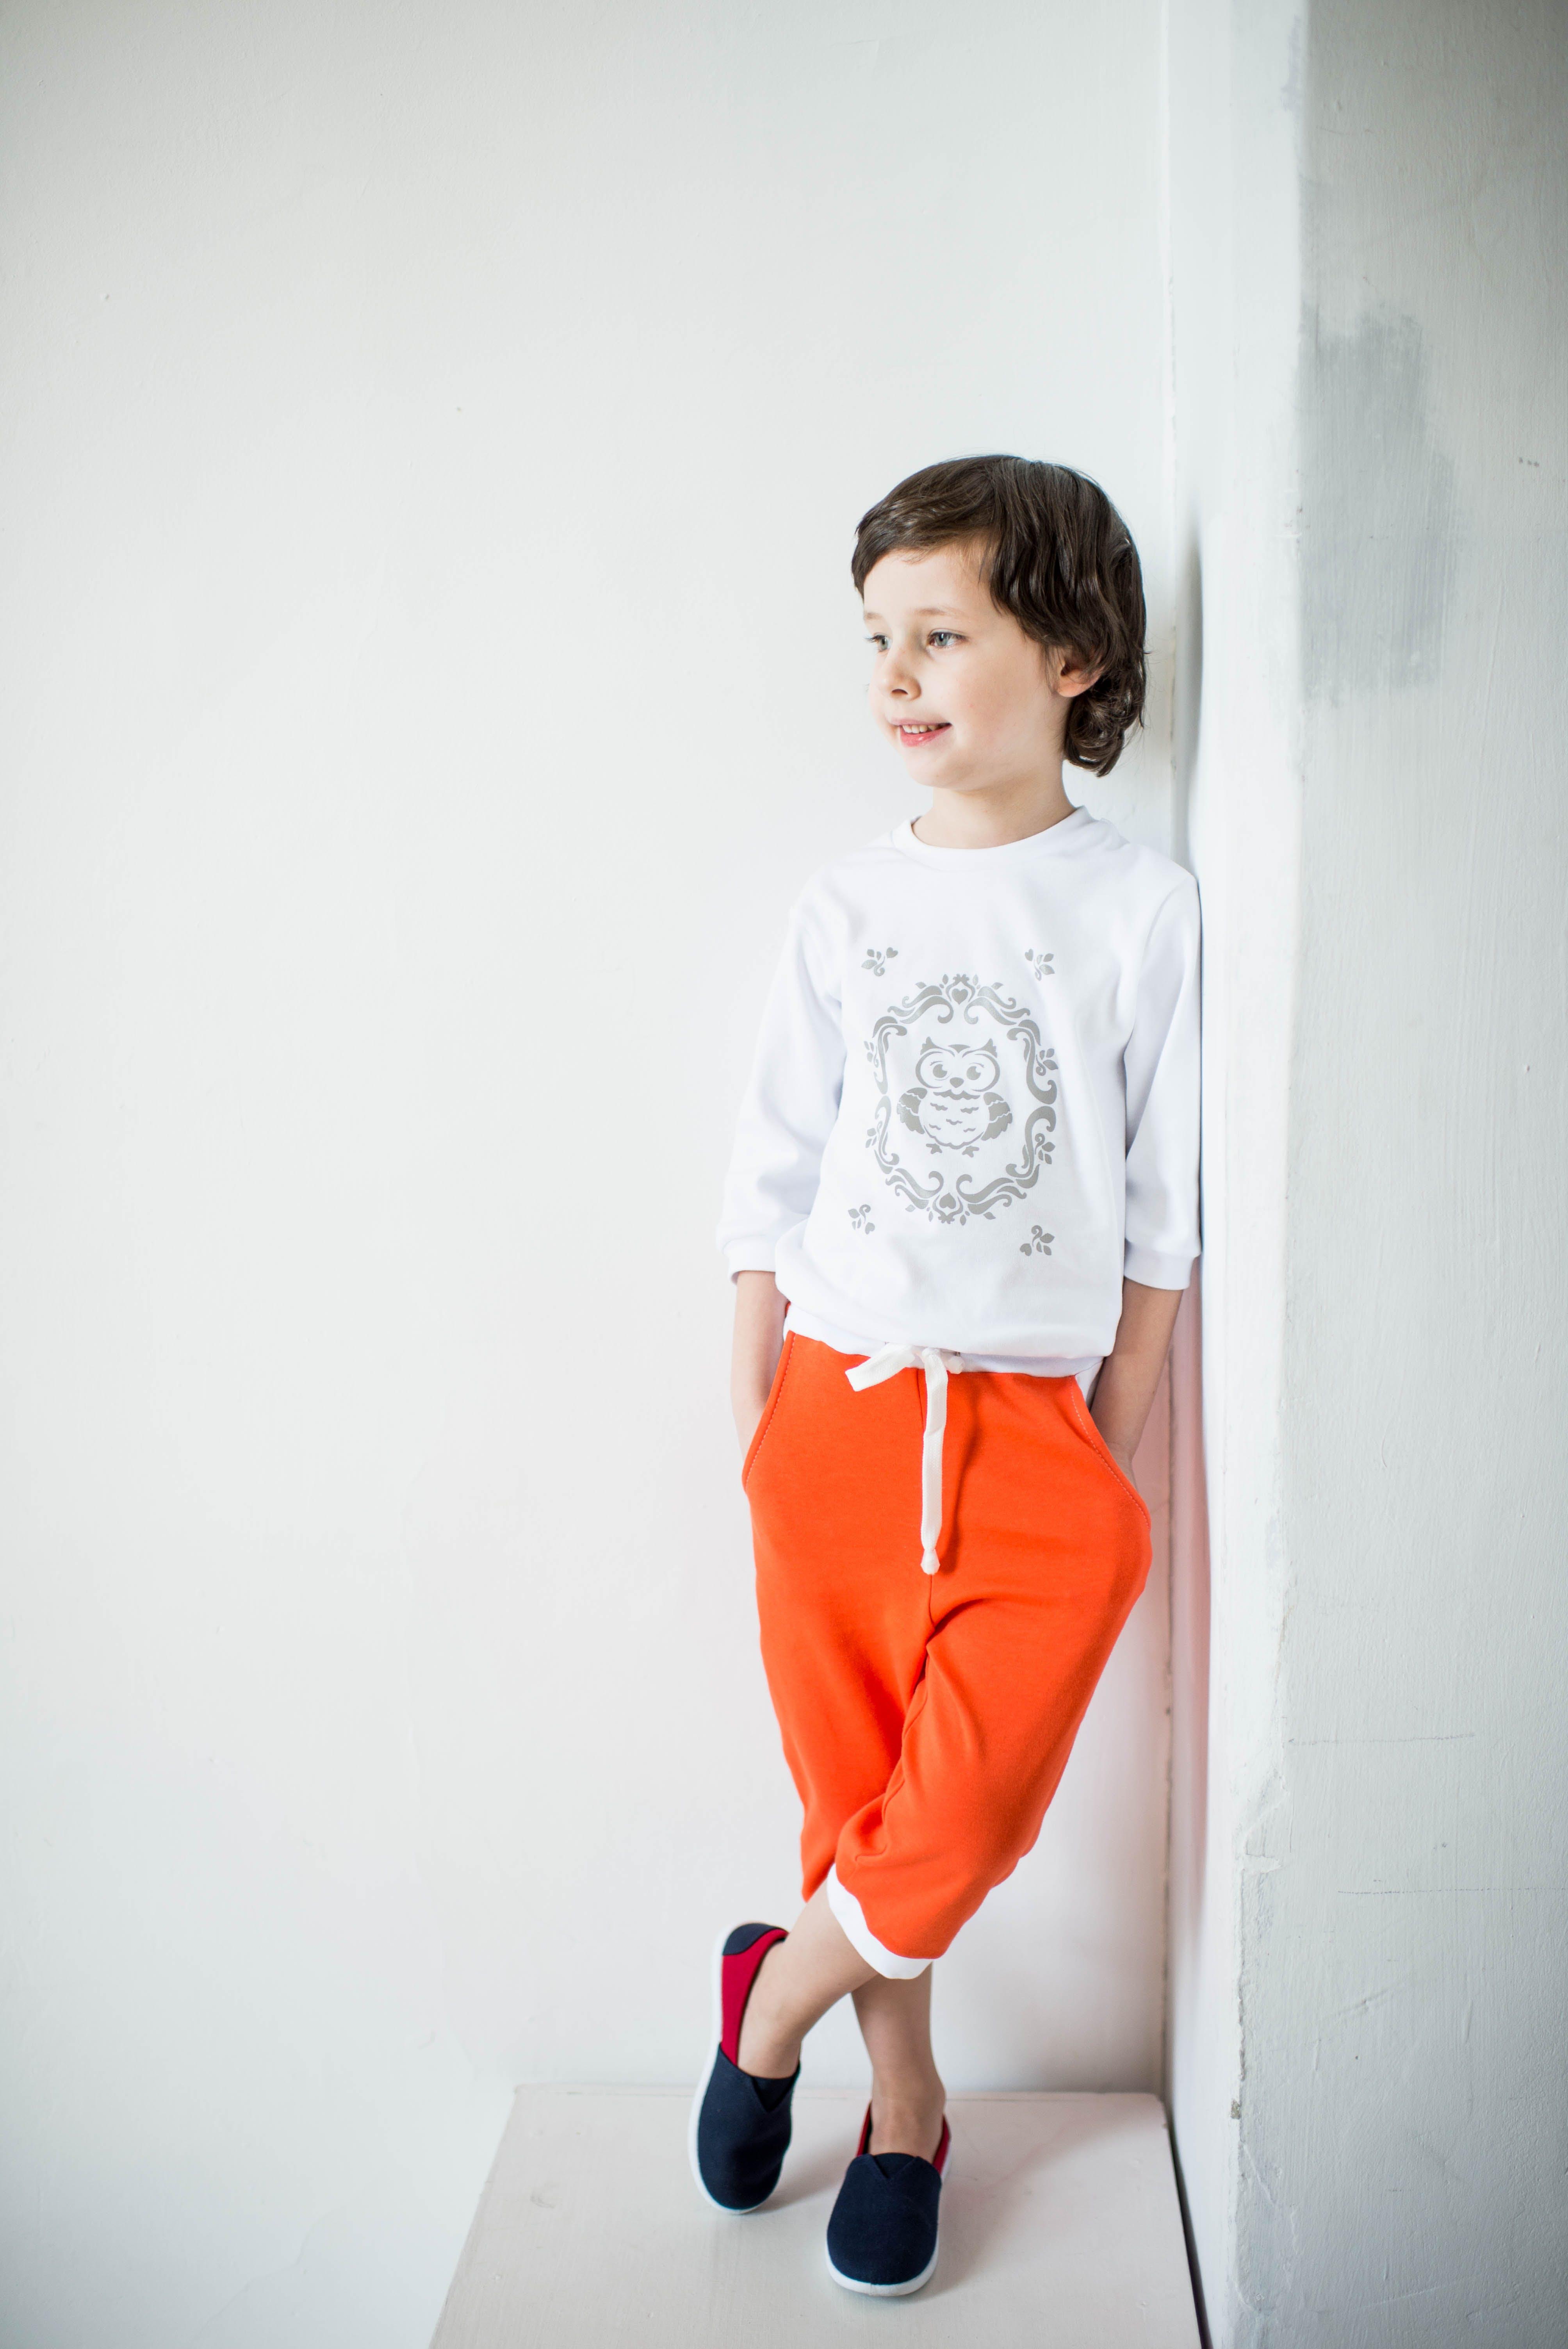 Boy Standing Beside Wall